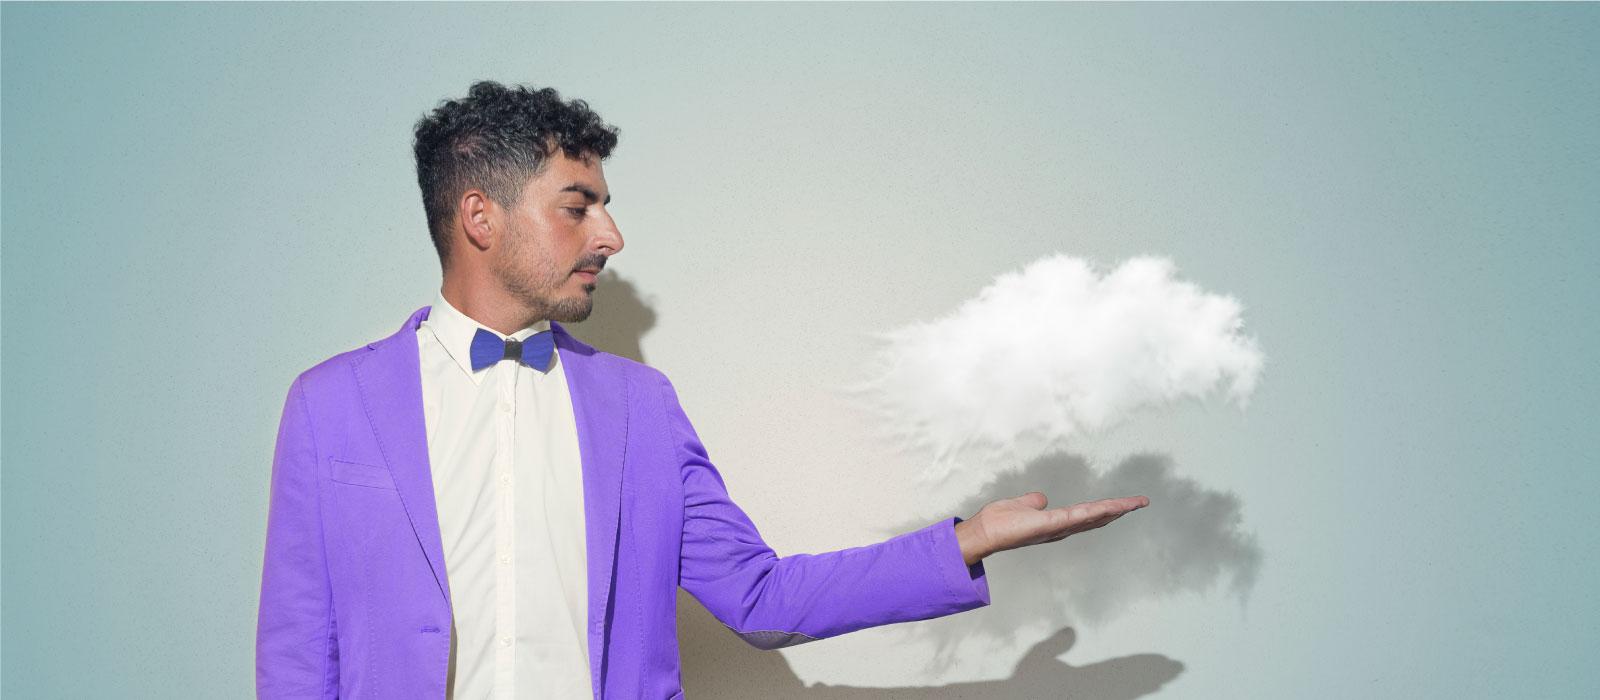 Cloud over a man's hand